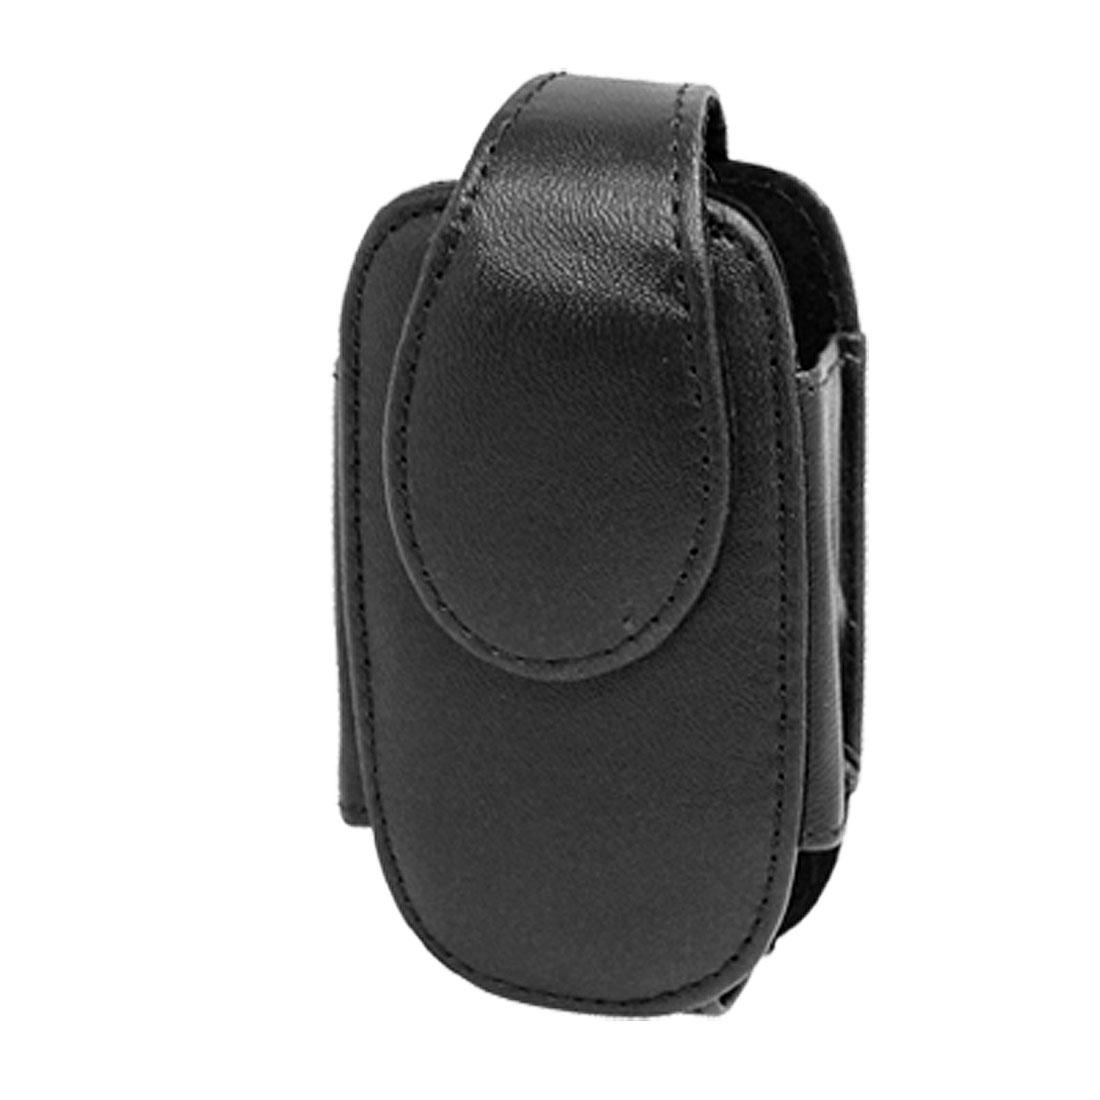 Black Protective Holder Cover Faux Leather Case for Motorola V303